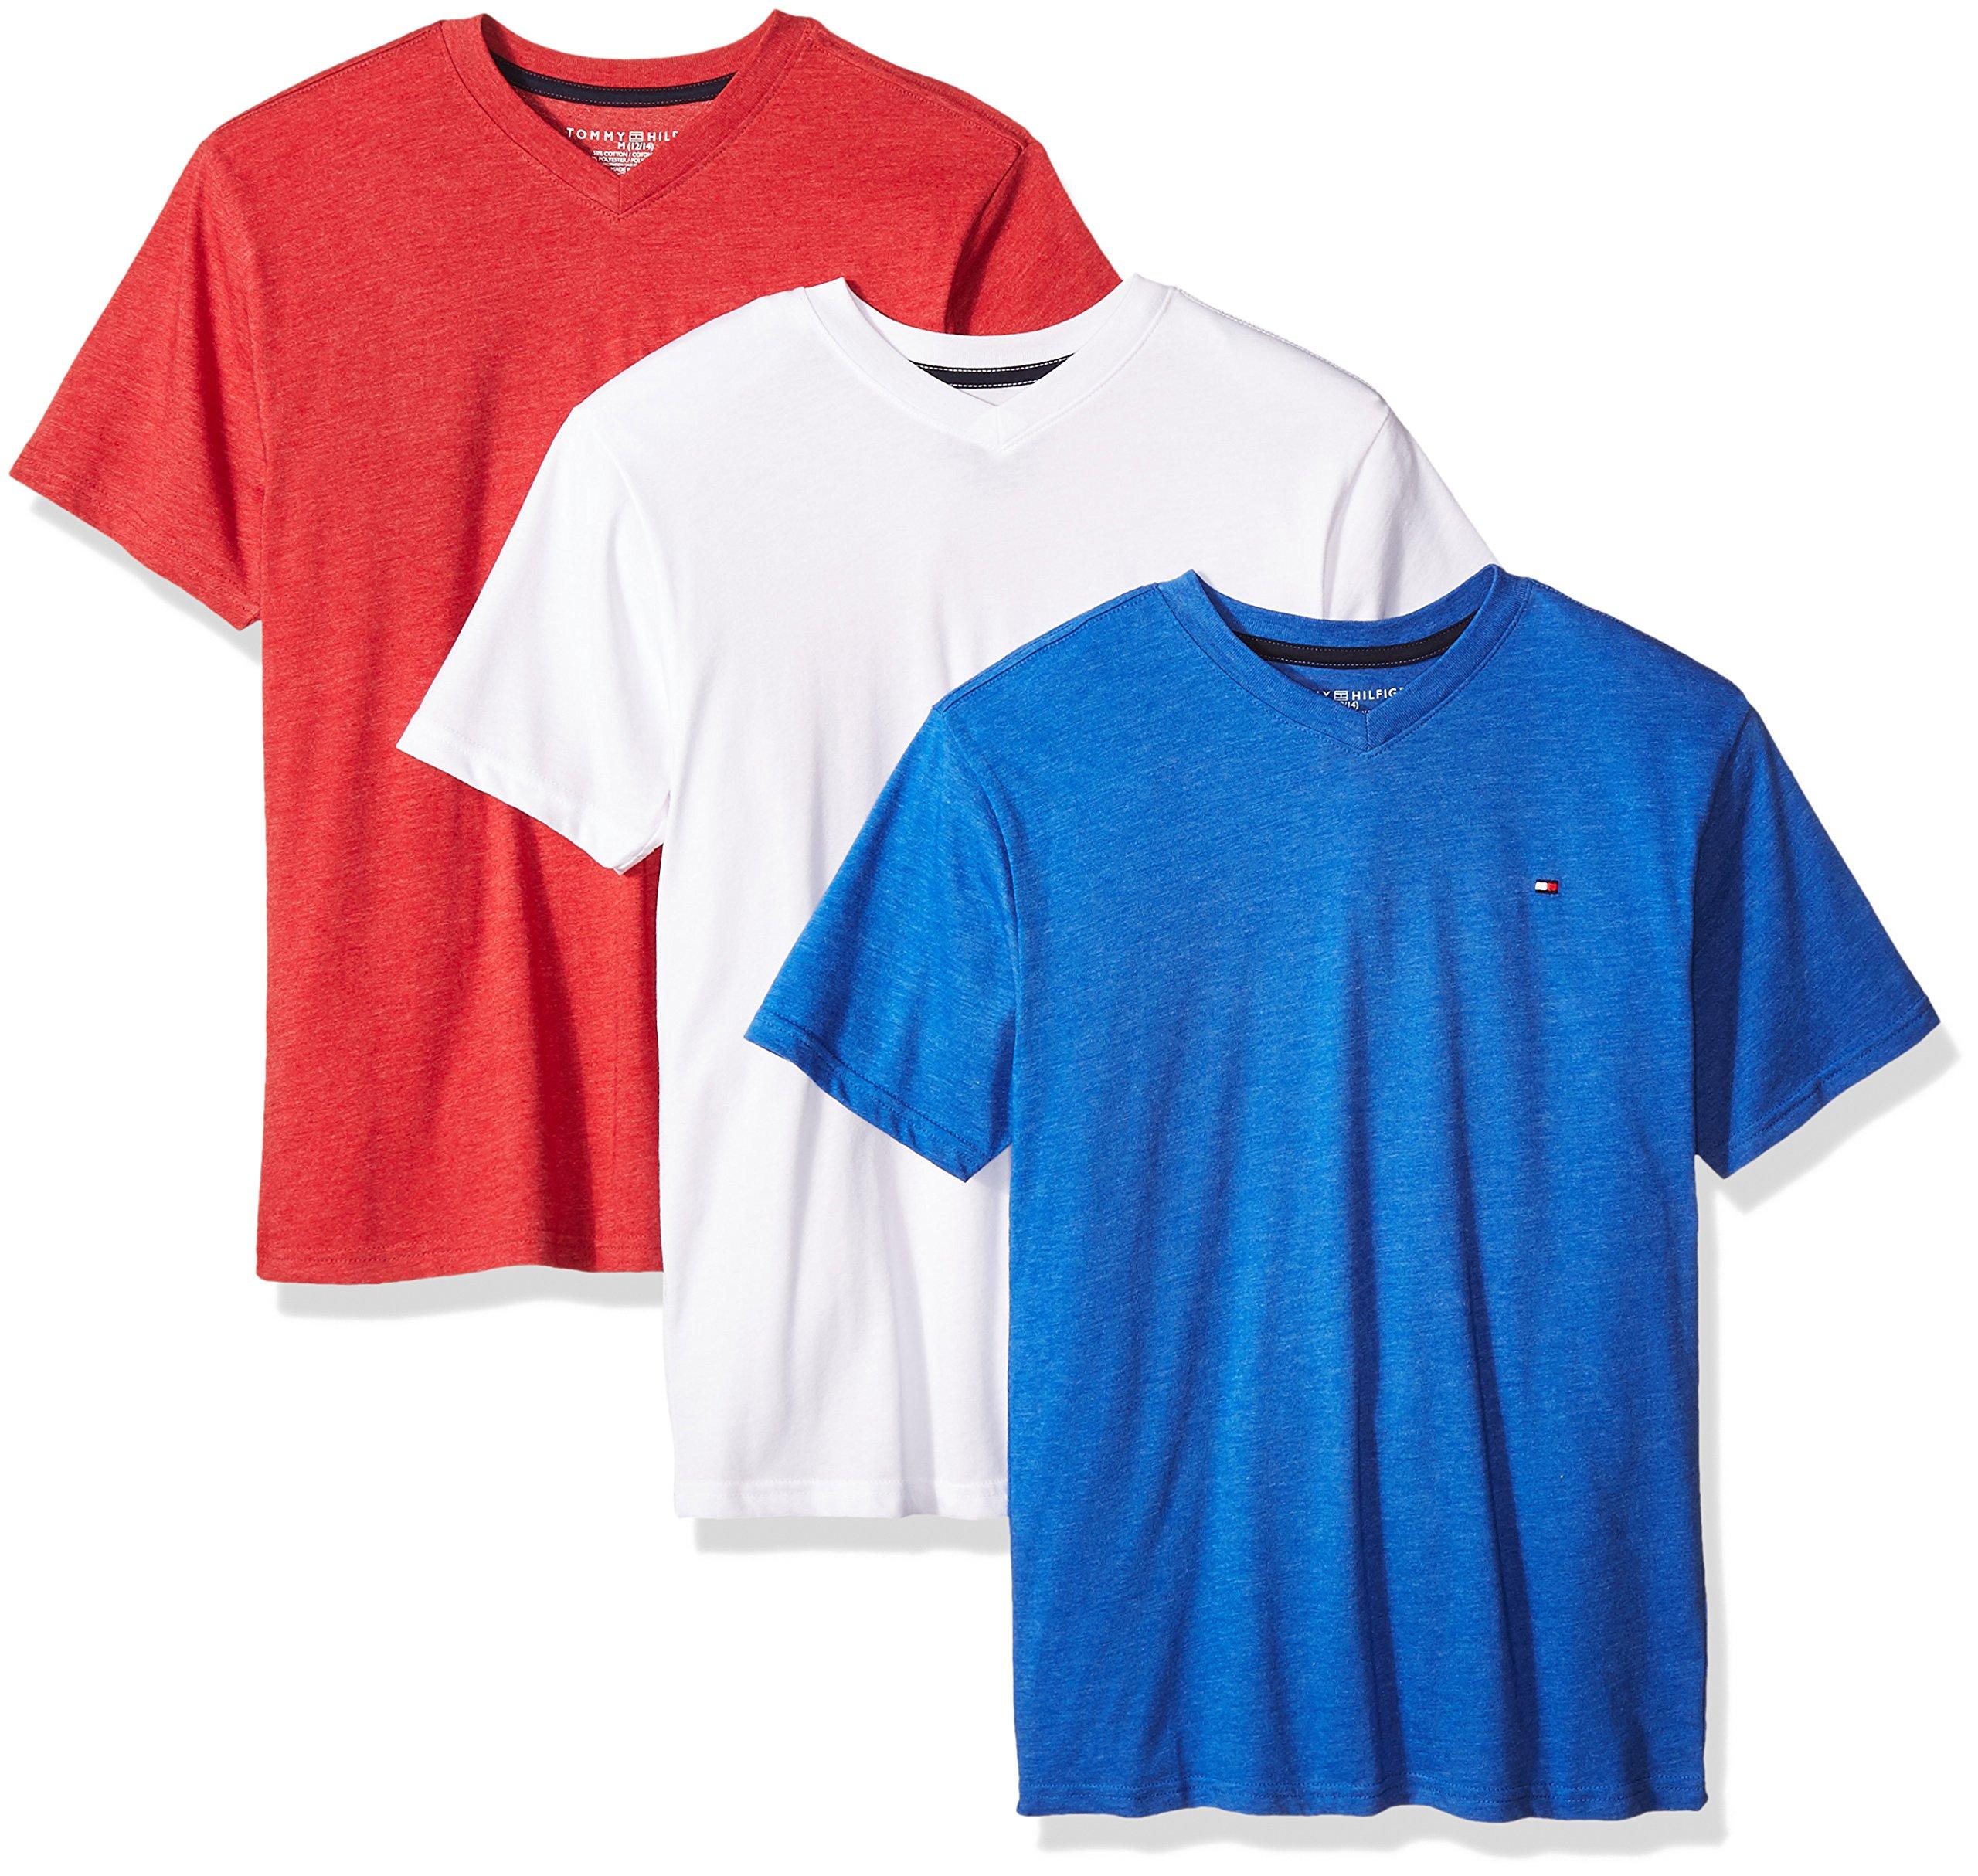 Tommy Hilfiger Big Boys' Core V-Neck Tee 3 Piece Bundle, Blue Jean/Bullseye/White, Large